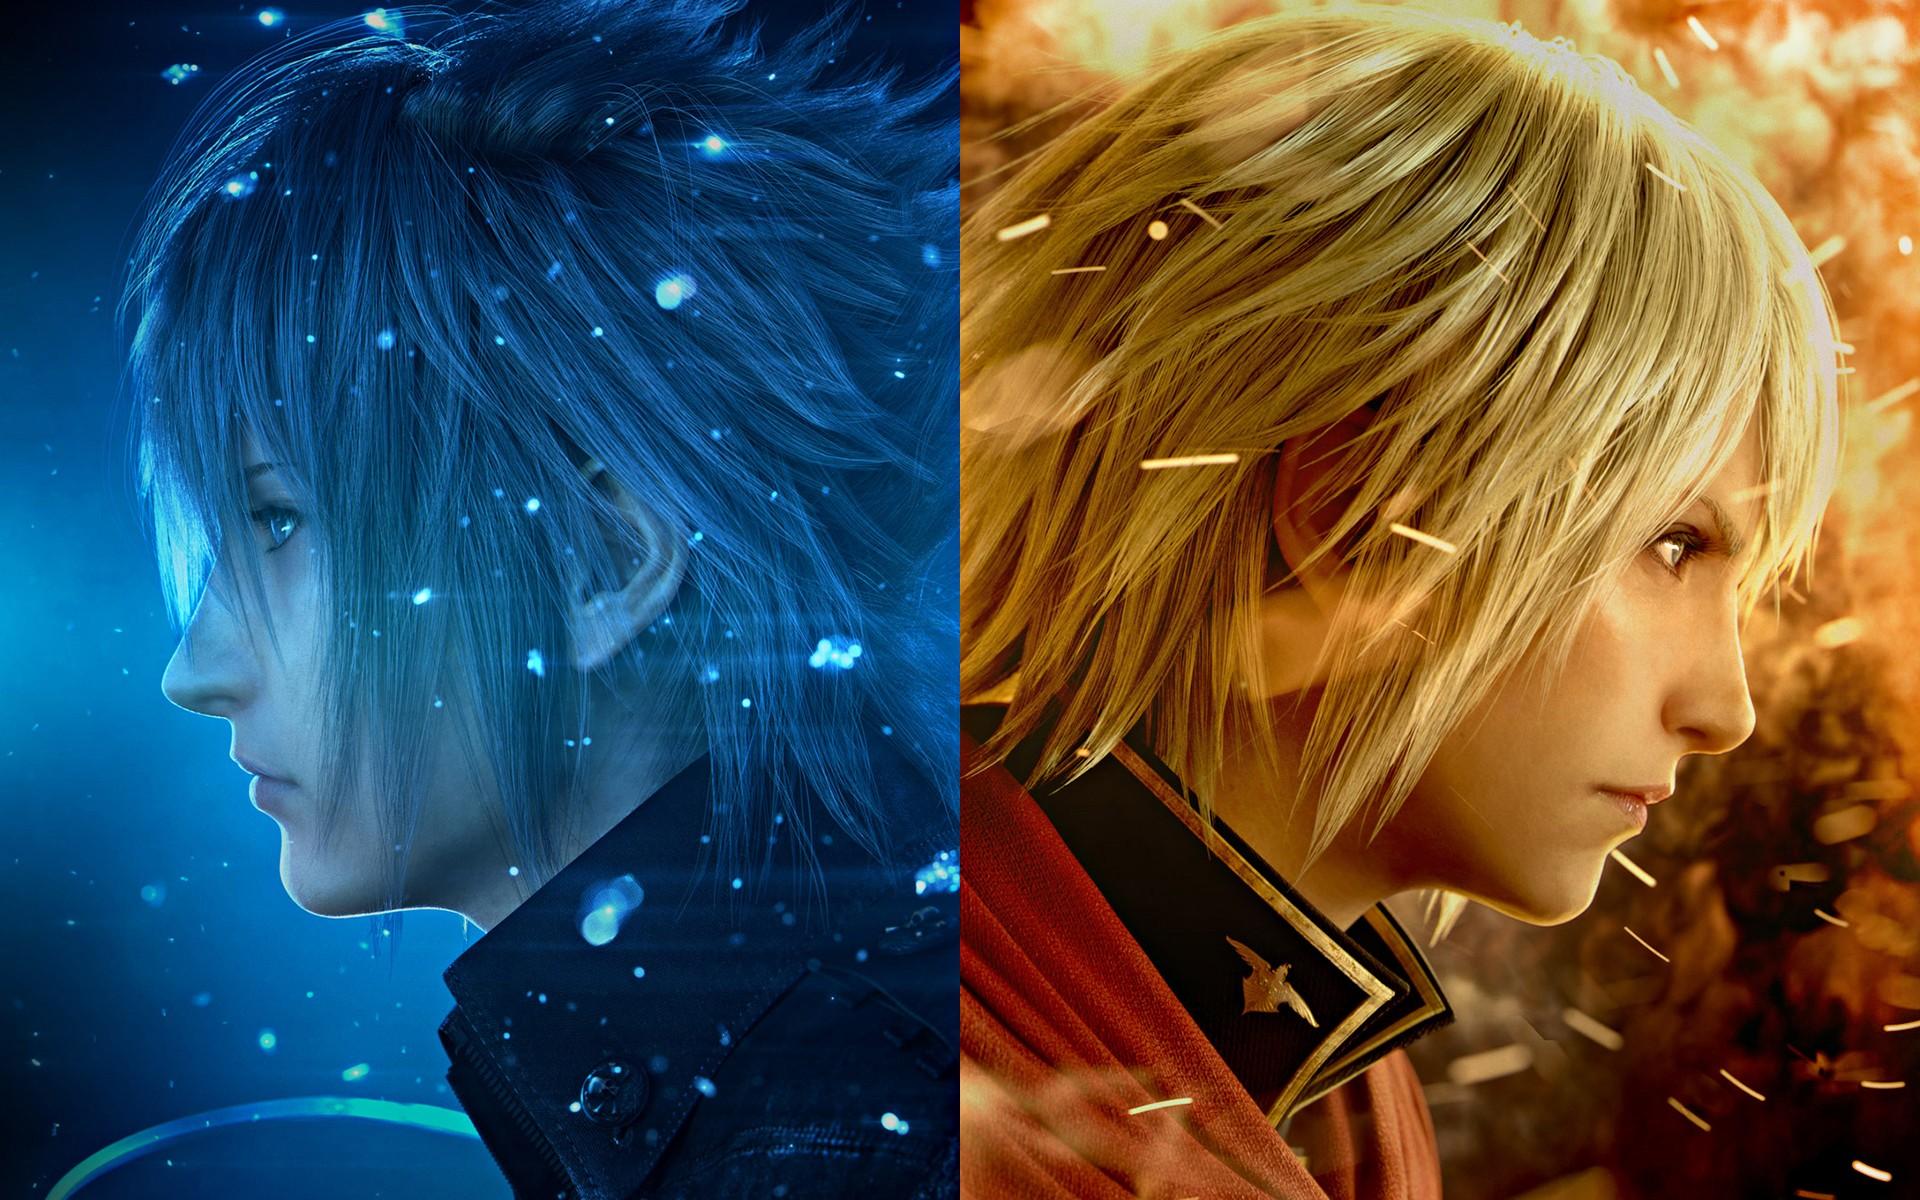 2560x1080 Luna Final Fantasy Xv 4k 2560x1080 Resolution Hd: 2048x1152 Final Fantasy Type 0 2048x1152 Resolution HD 4k